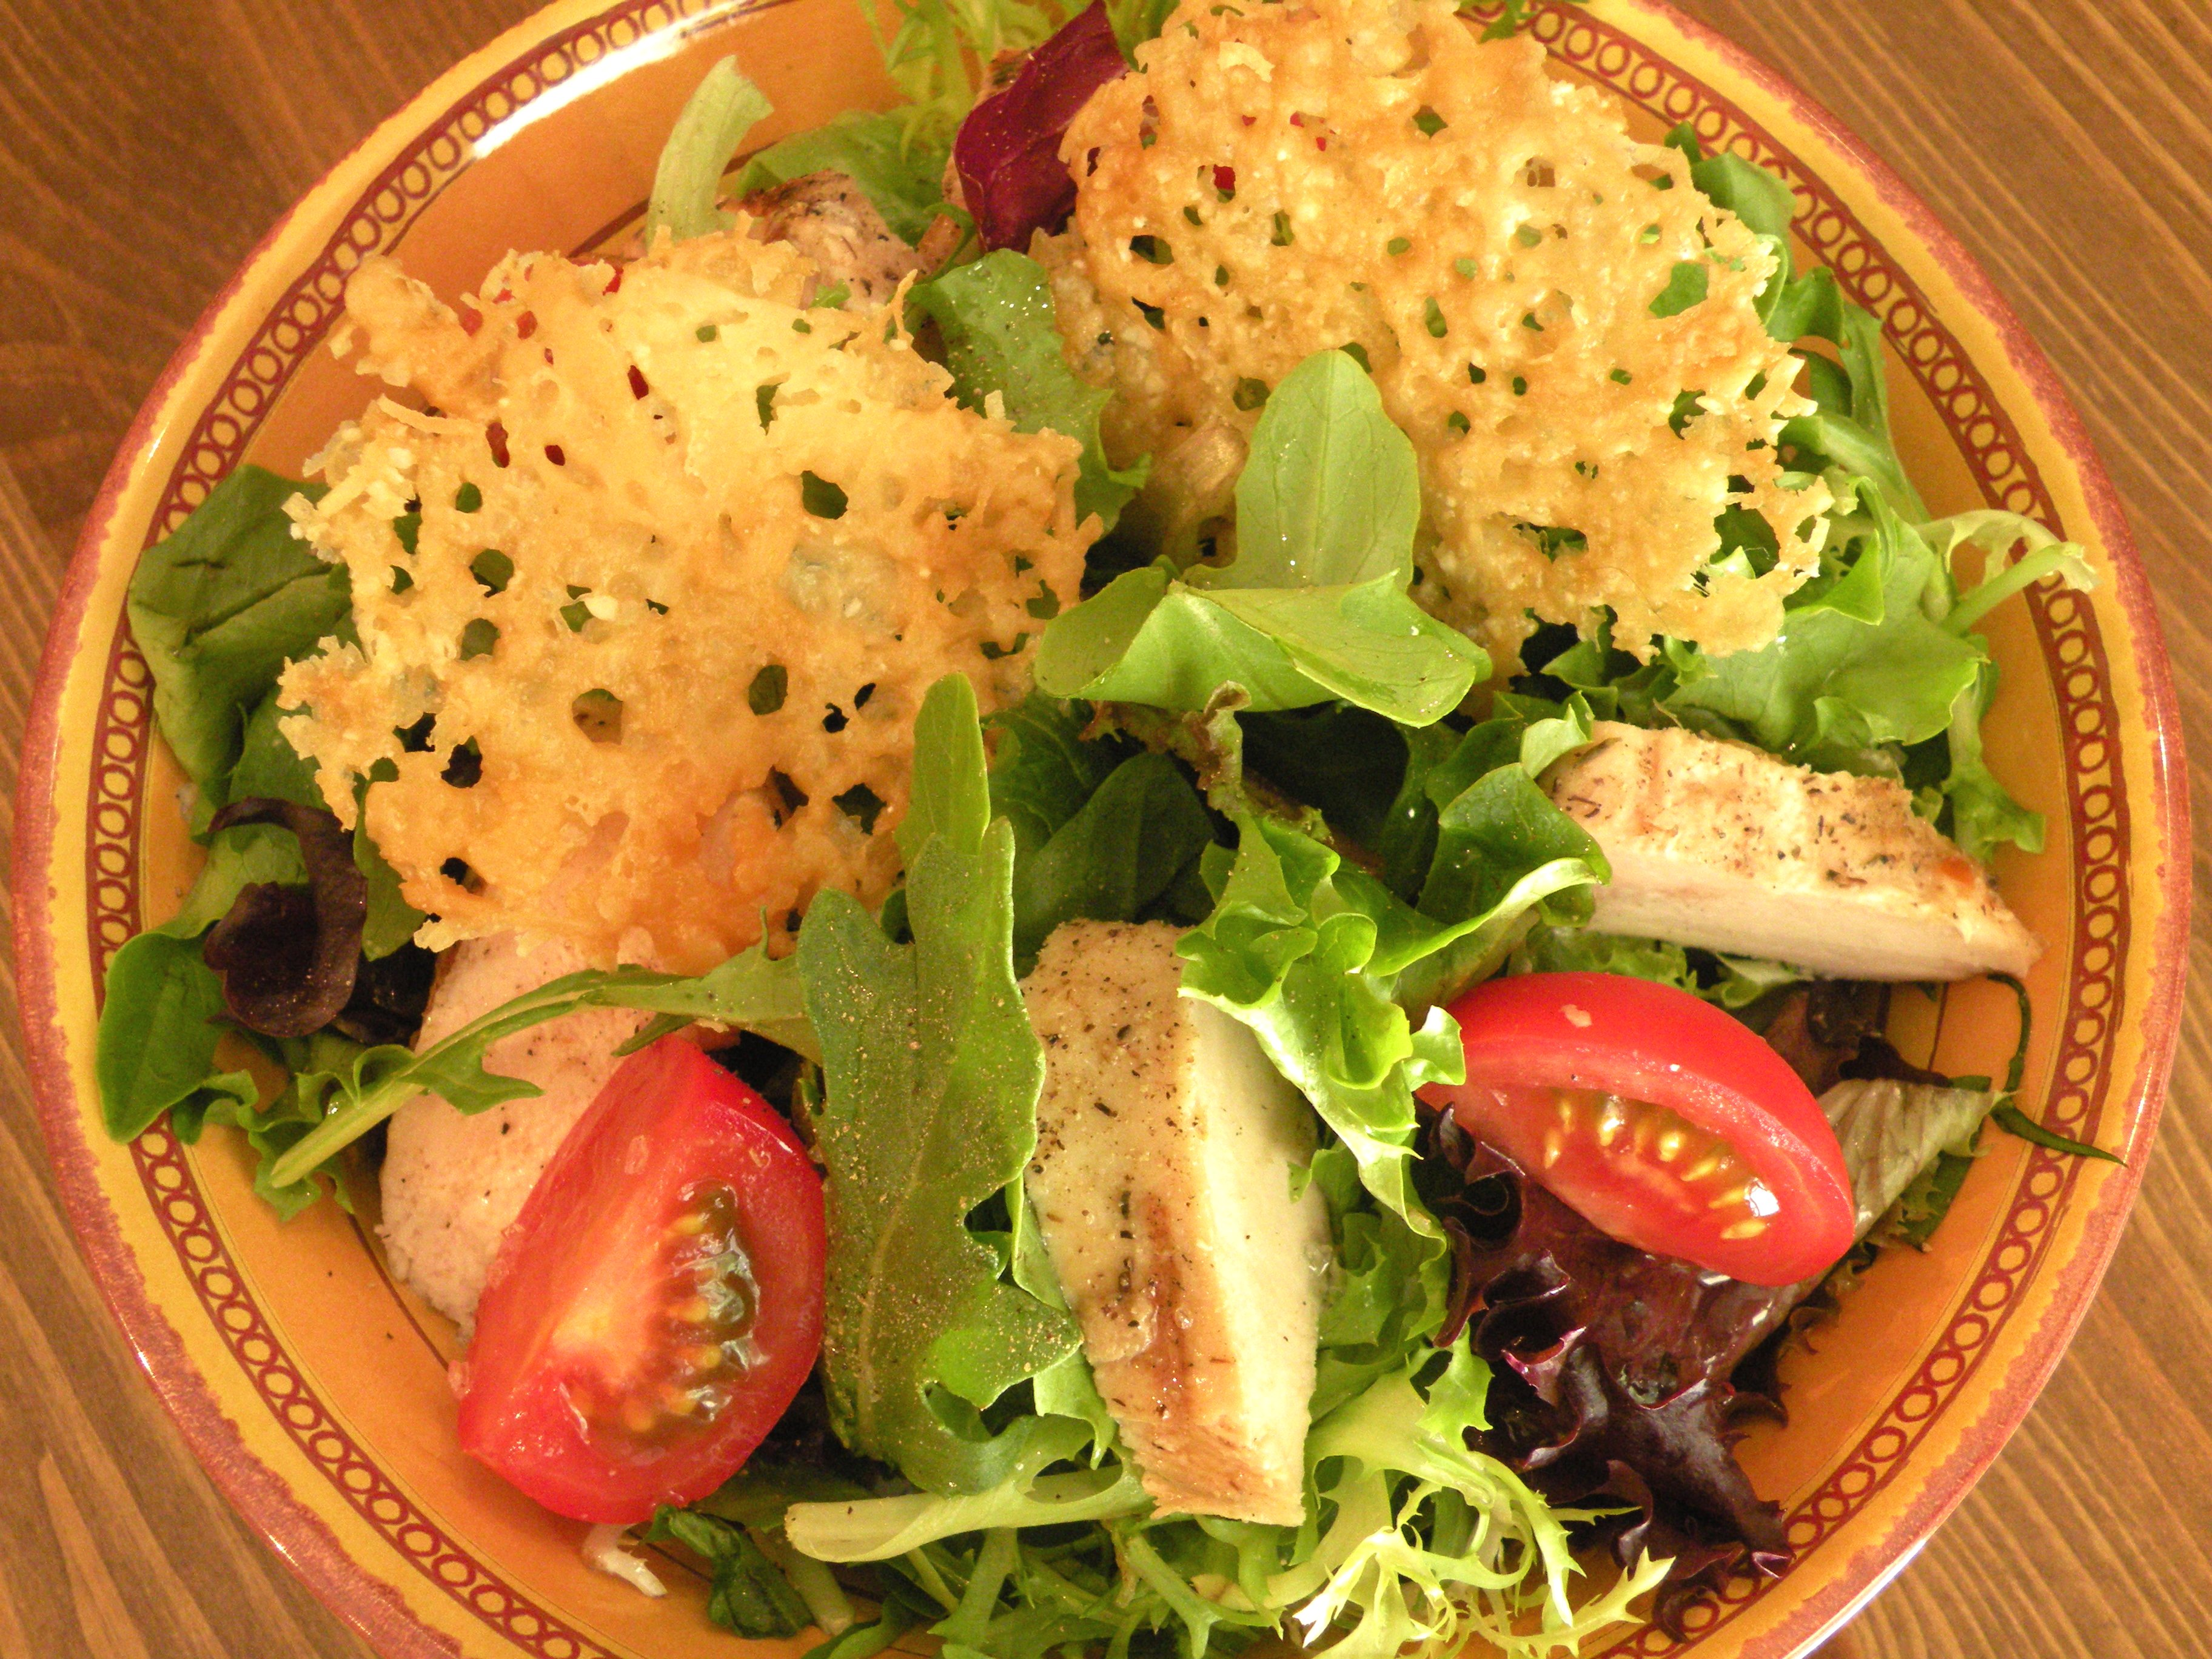 Salad wide